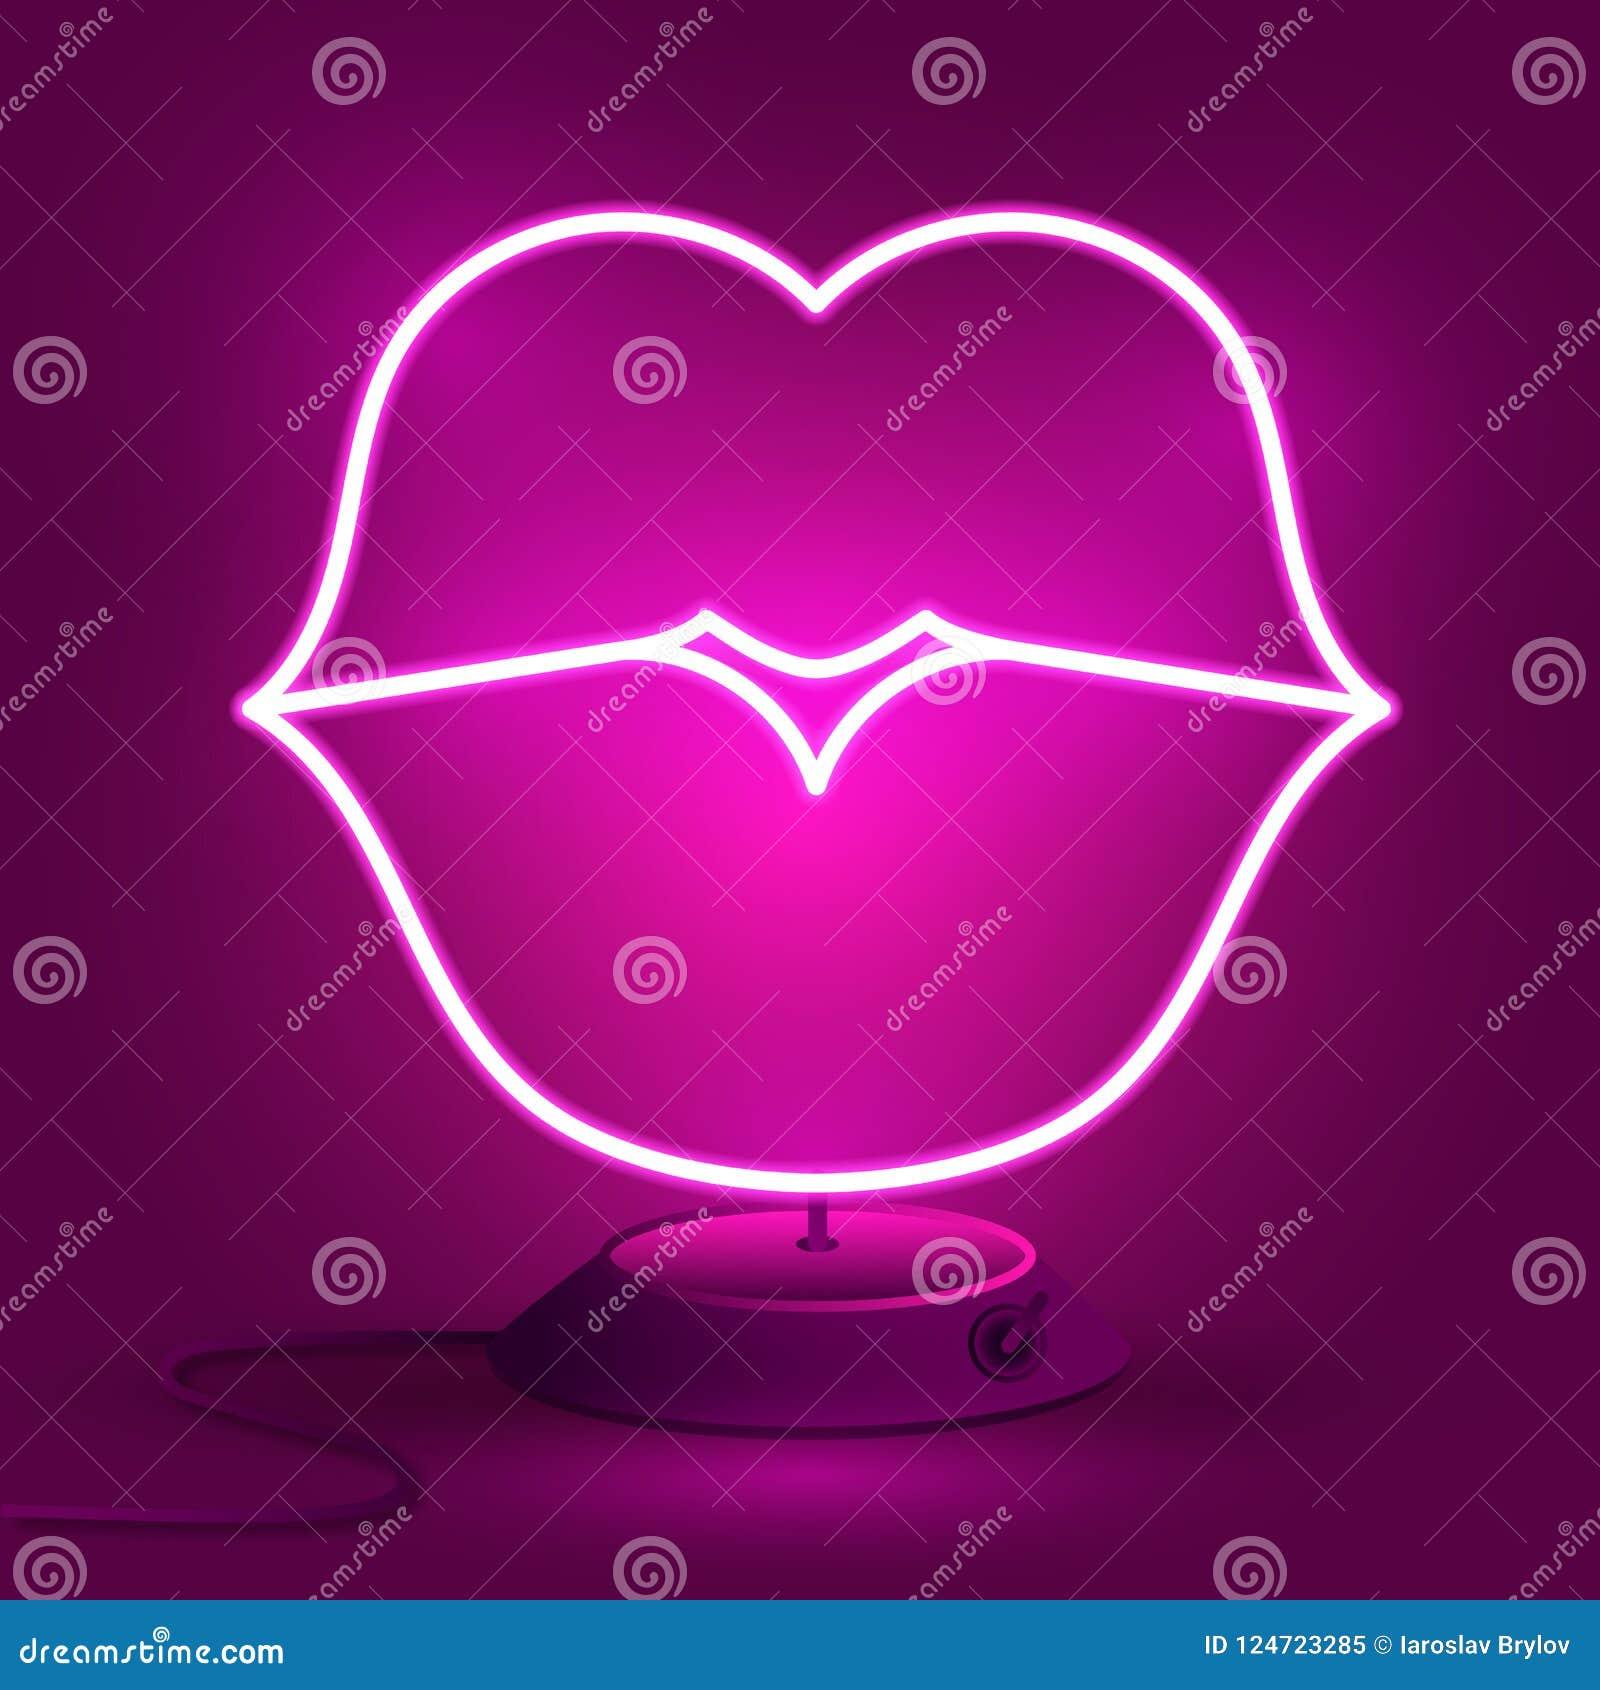 Day erotic greeting valentine are mistaken